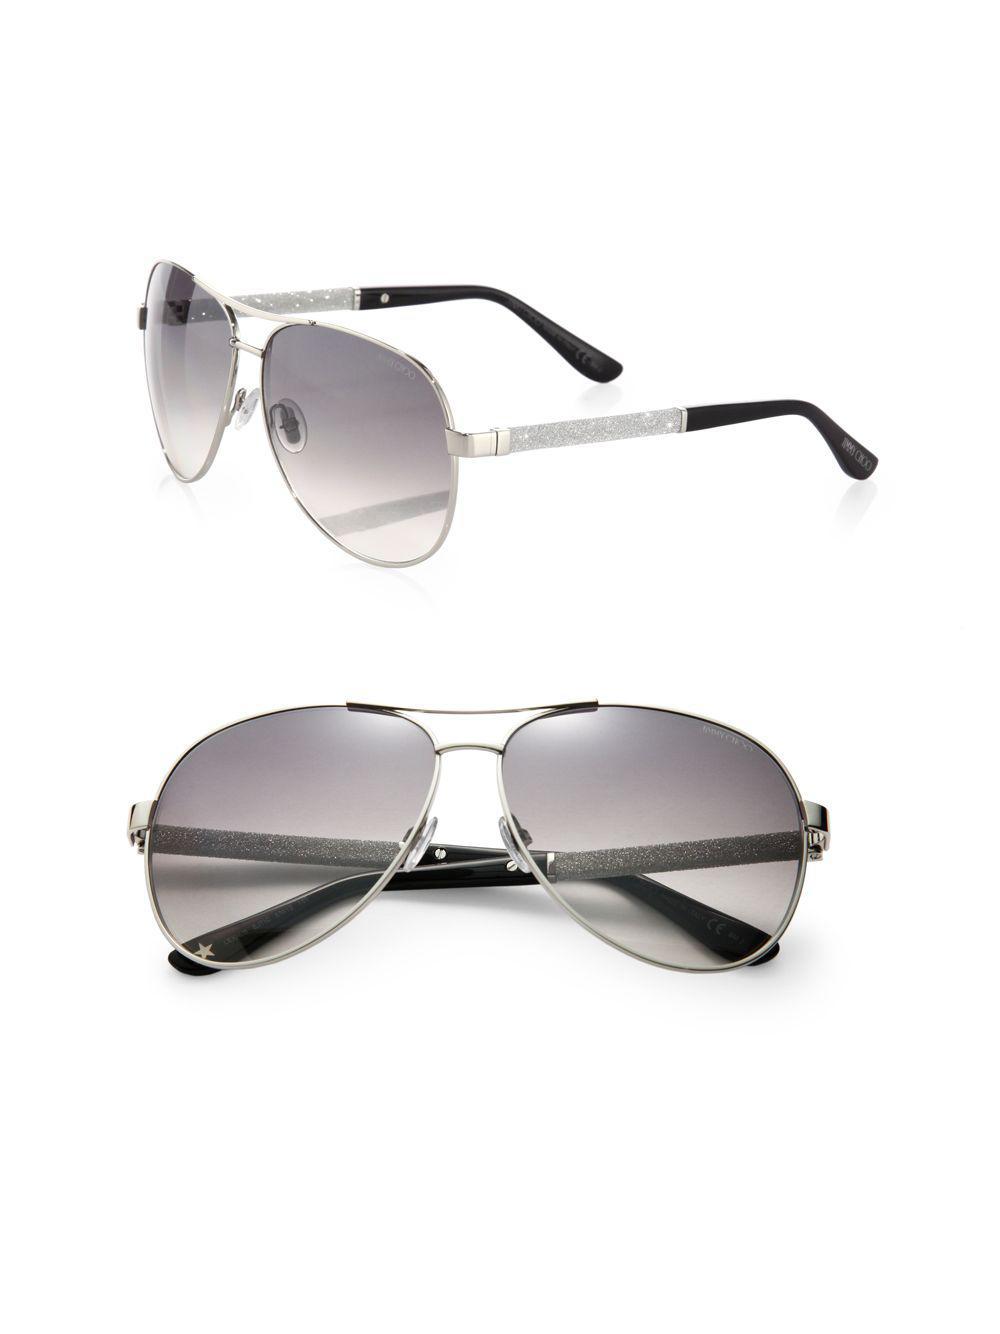 6a0fa52584b Lyst - Jimmy Choo Lexie Aviator Sunglasses